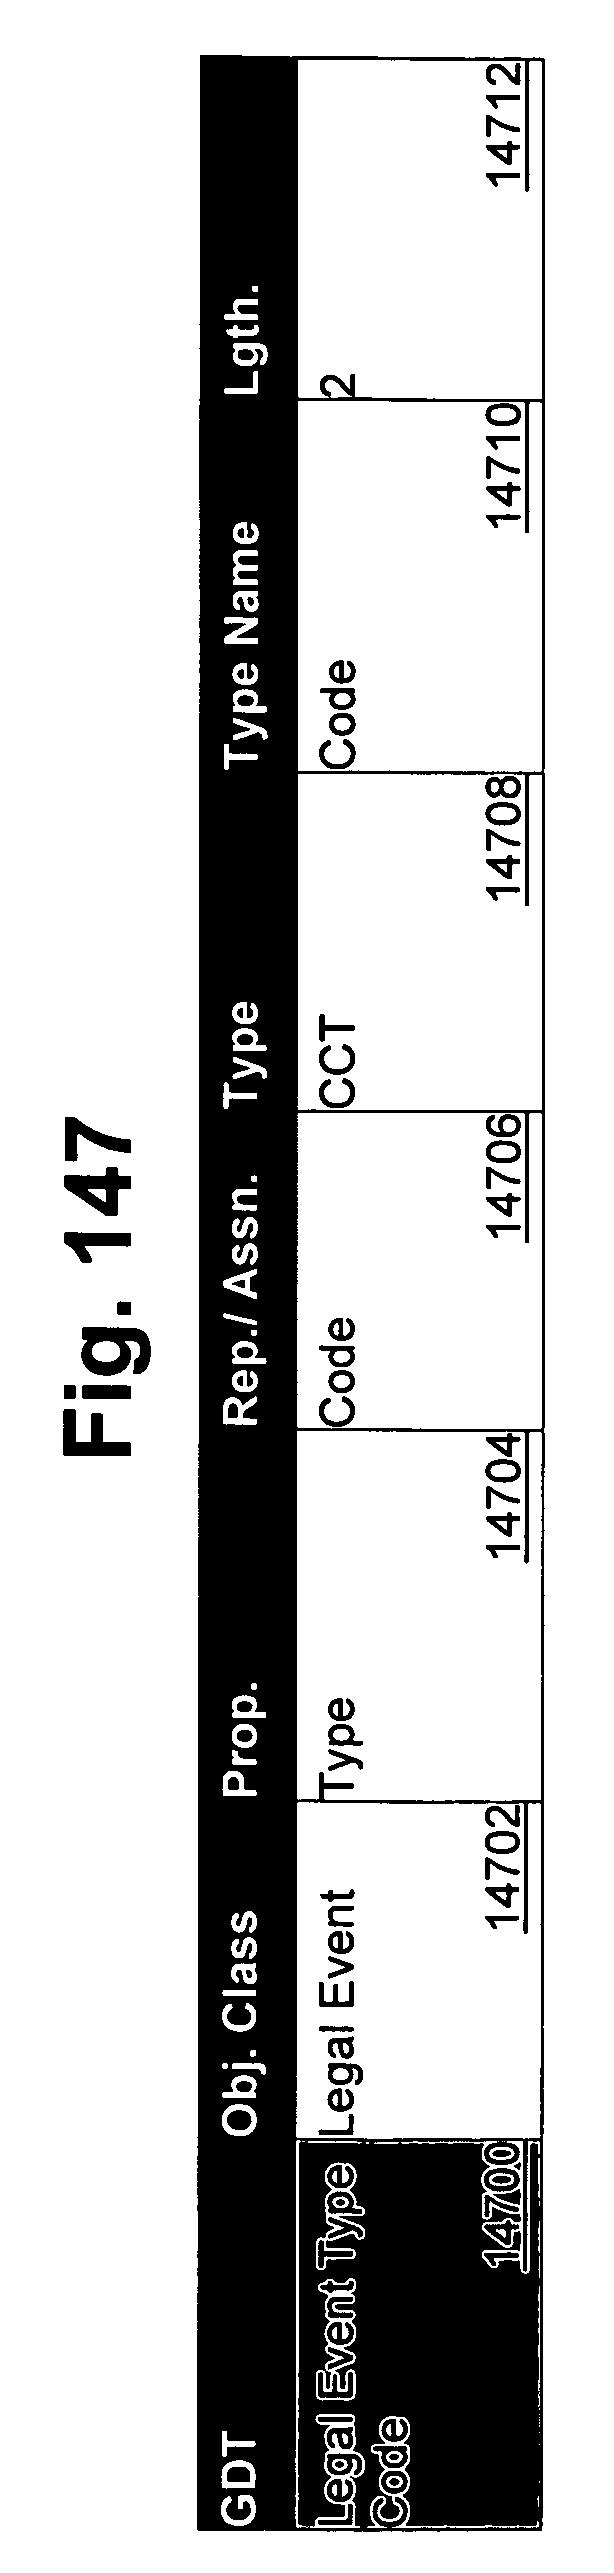 dd standard oil abbreviator with cdrom